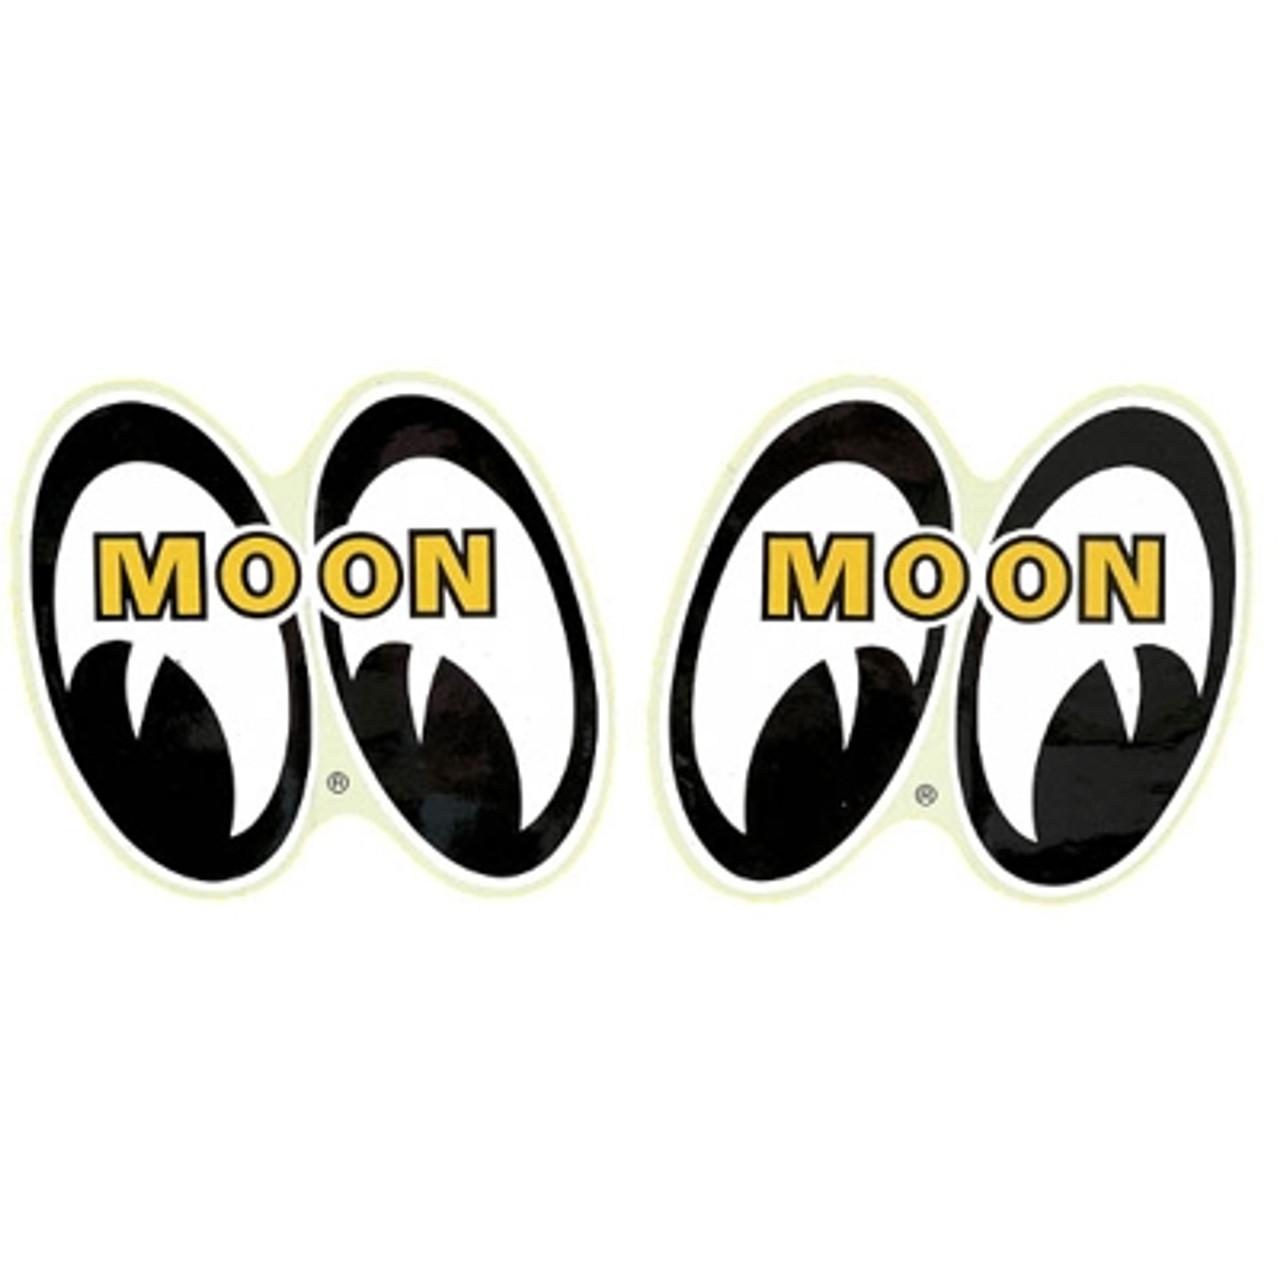 Mooneyes Sticker Small Sheet